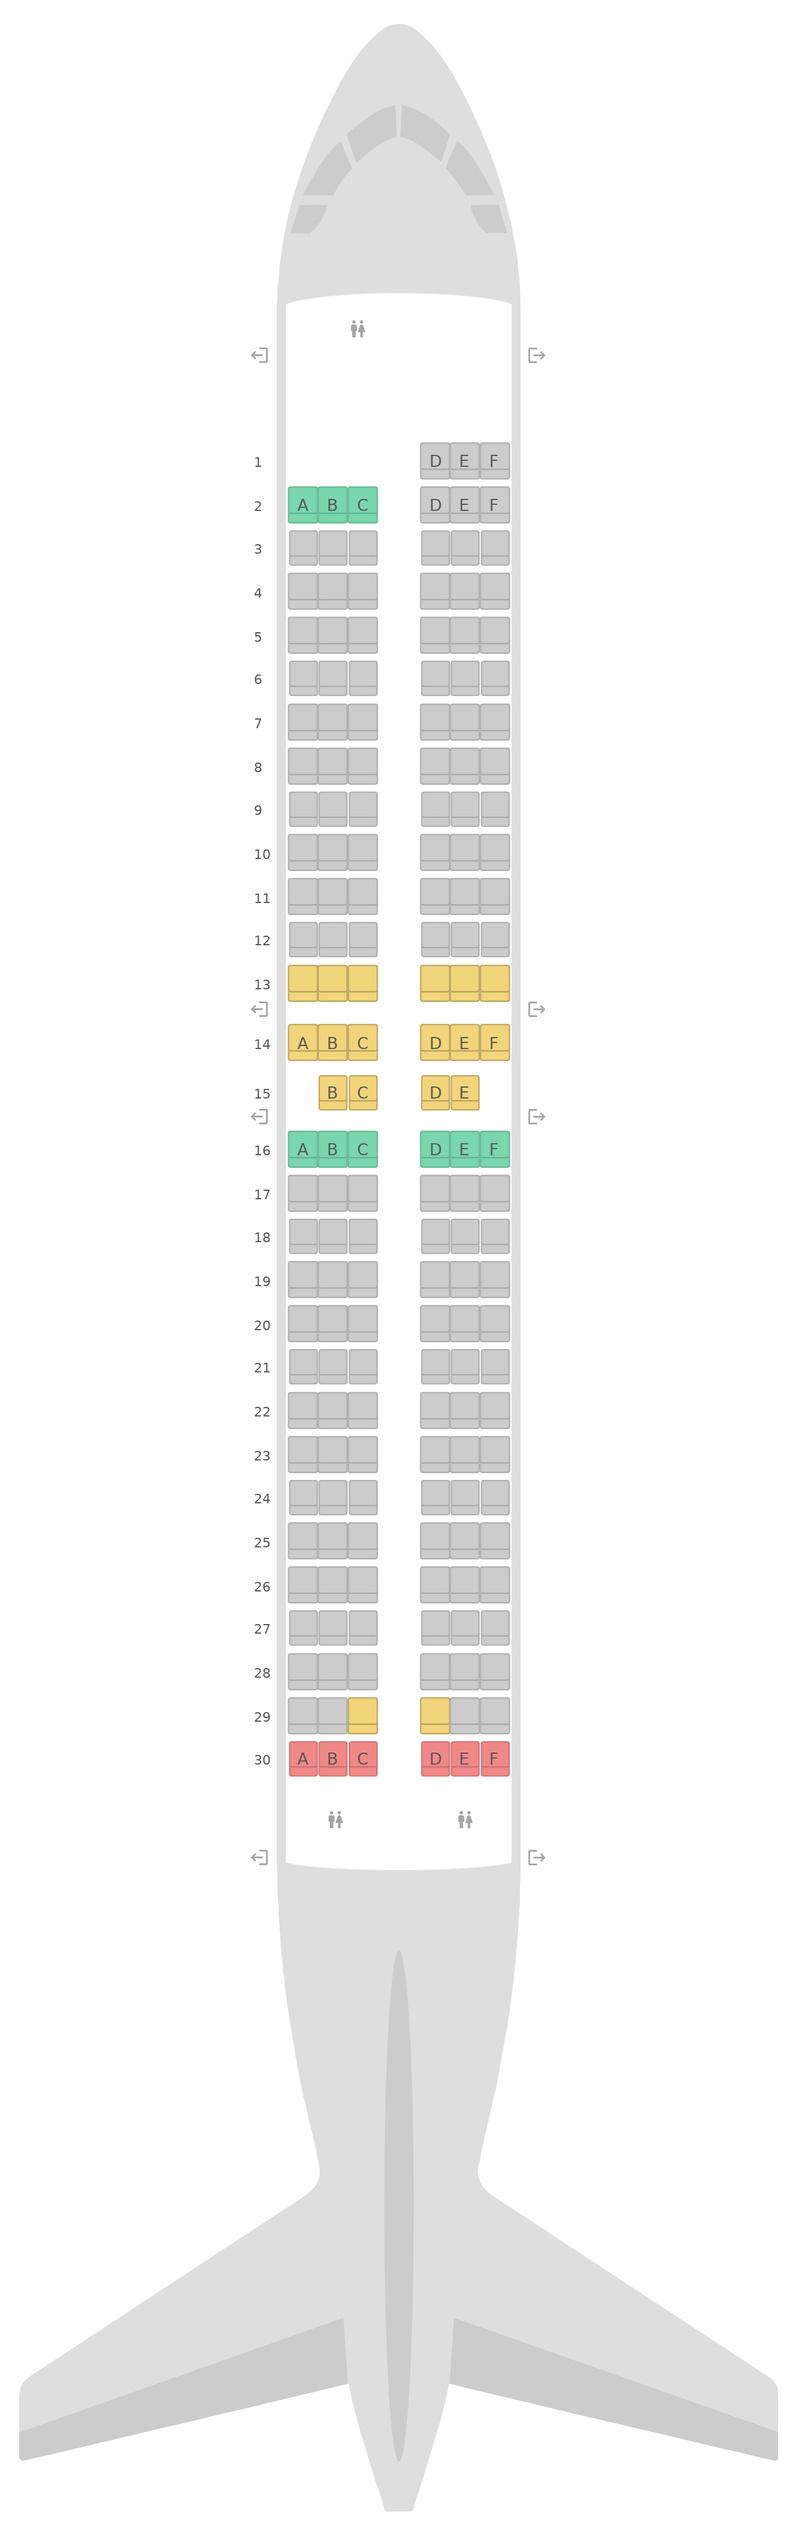 Mapa de asientos Boeing 737 MAX (7M8) Southwest Airlines